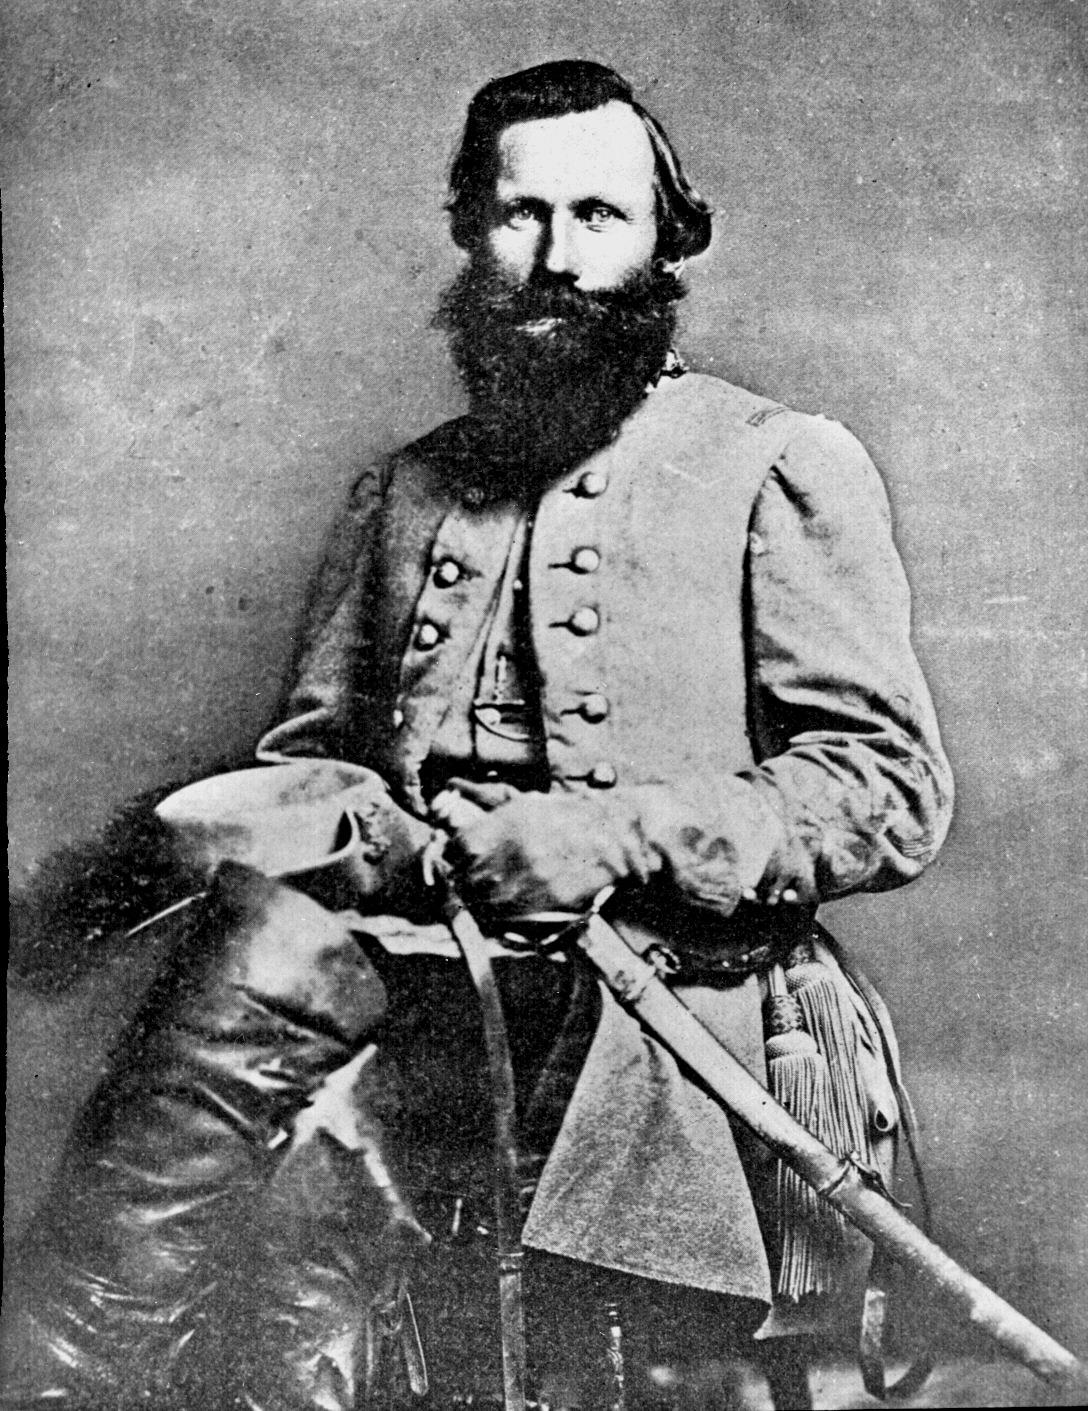 J.E.B. Stuart, Often blamed for the Confederate defeat at Gettysburg